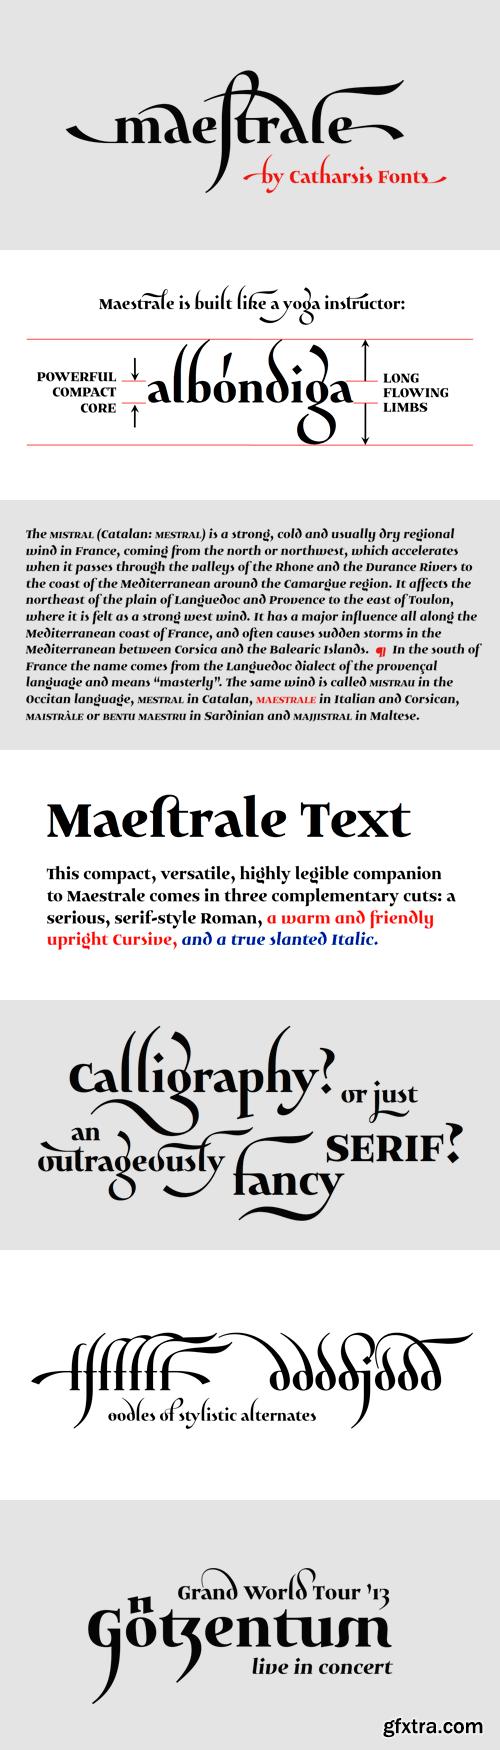 Maestrale Font Family - 5 Fonts for $60